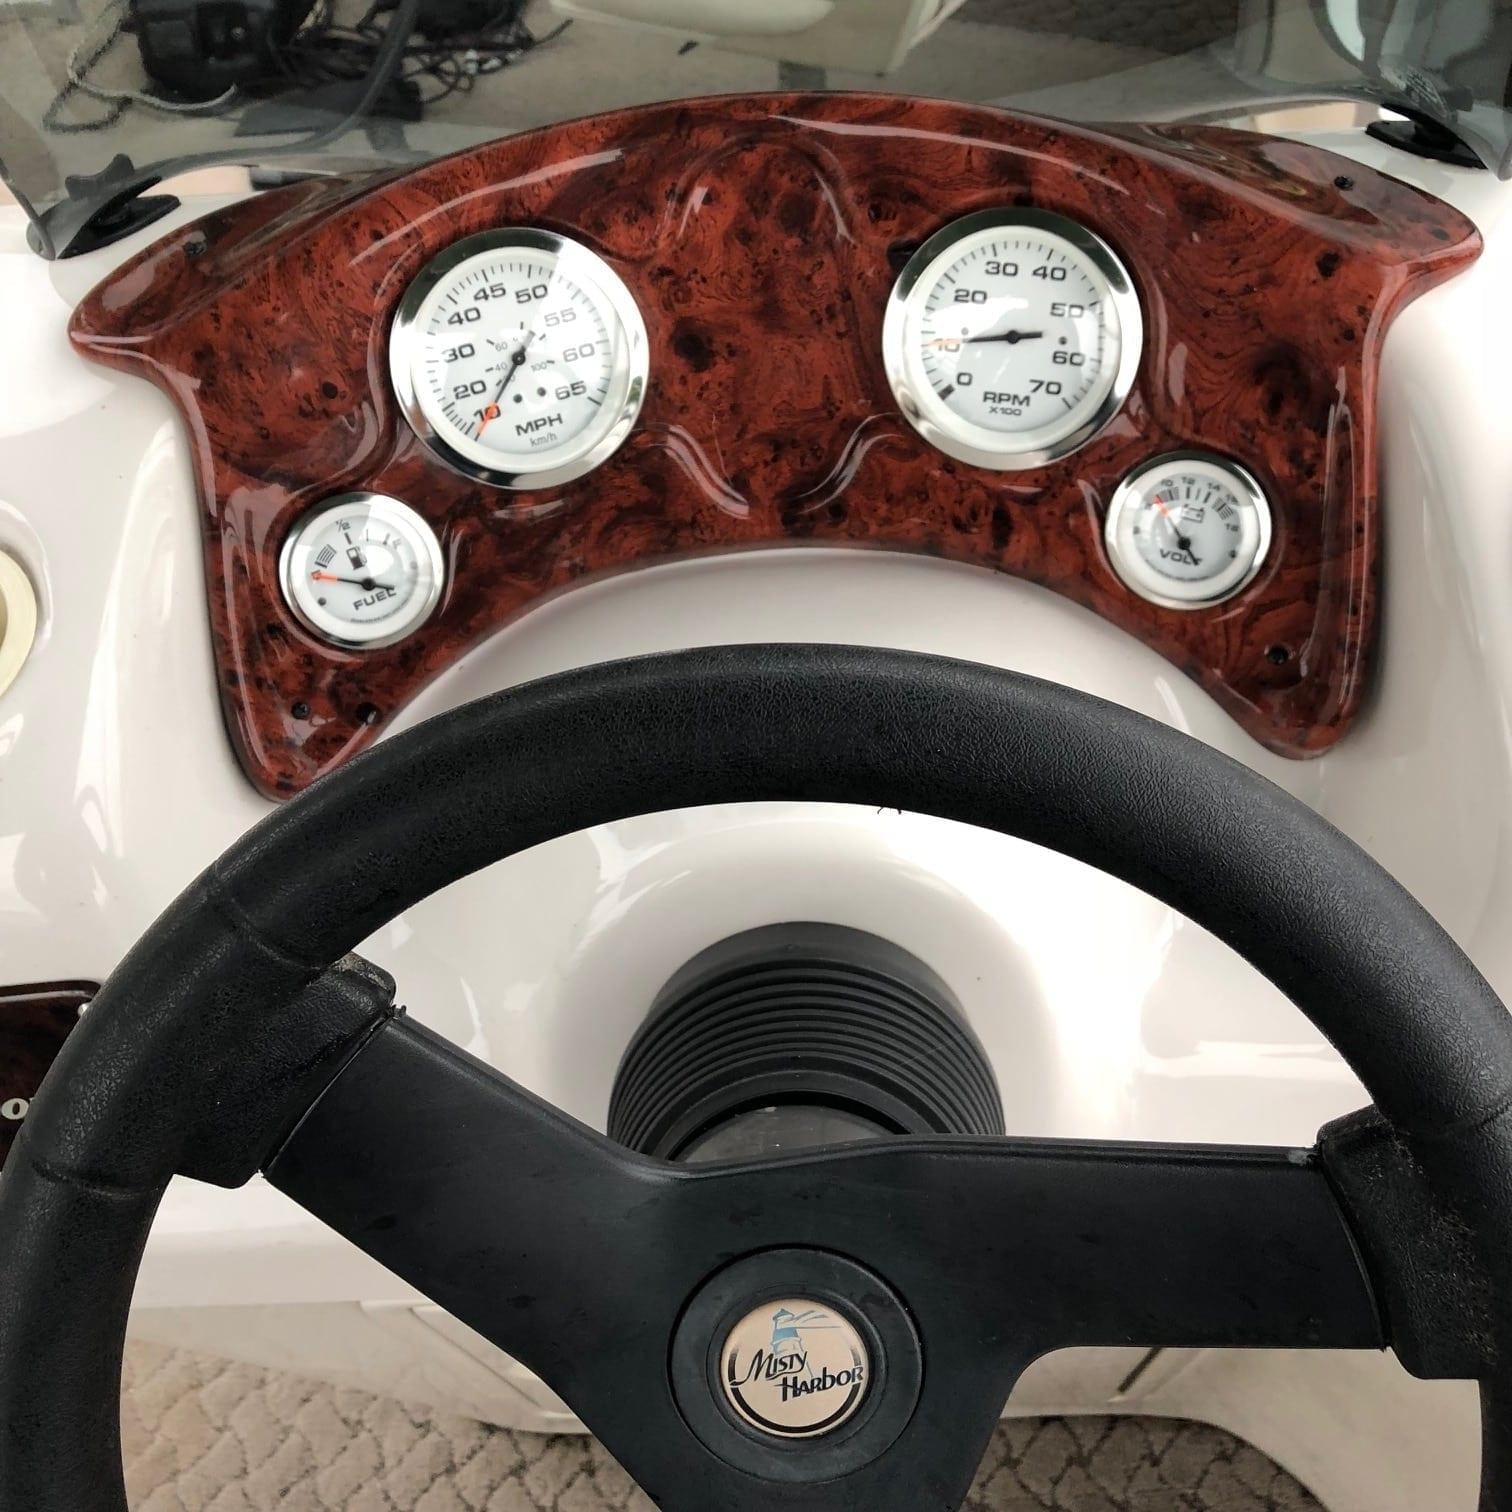 Boat steering wheel and dashboard.